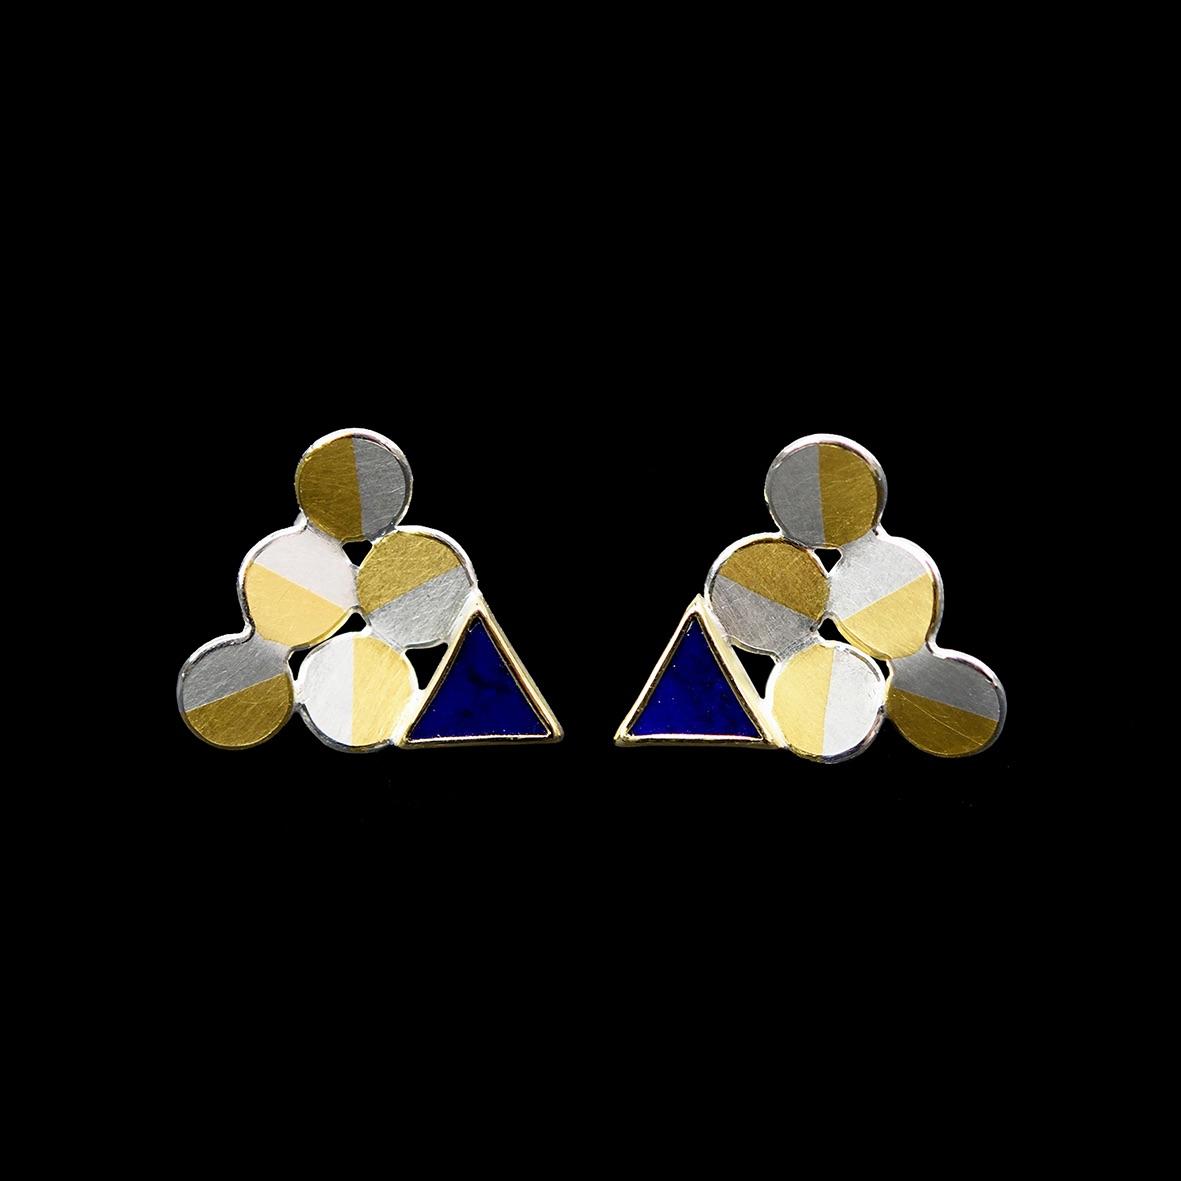 Triangle lapis earrings